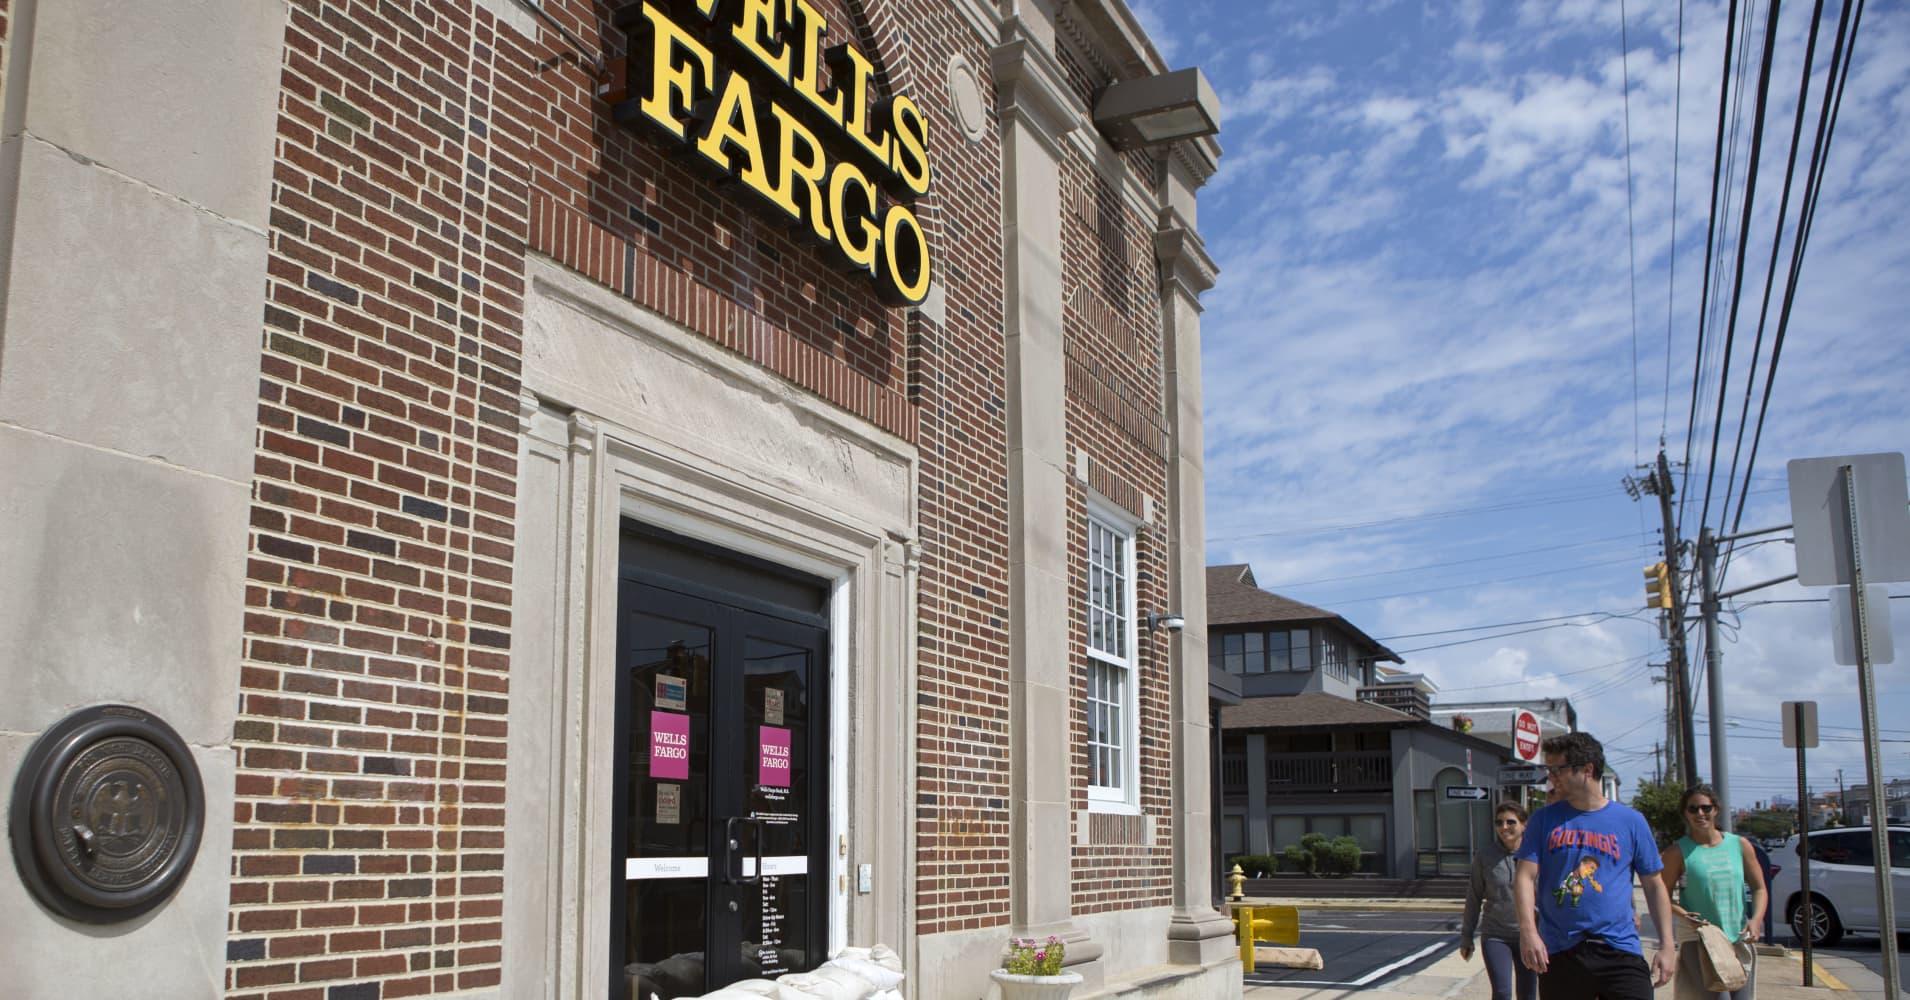 A showdown over Wells Fargo's board of directors looms